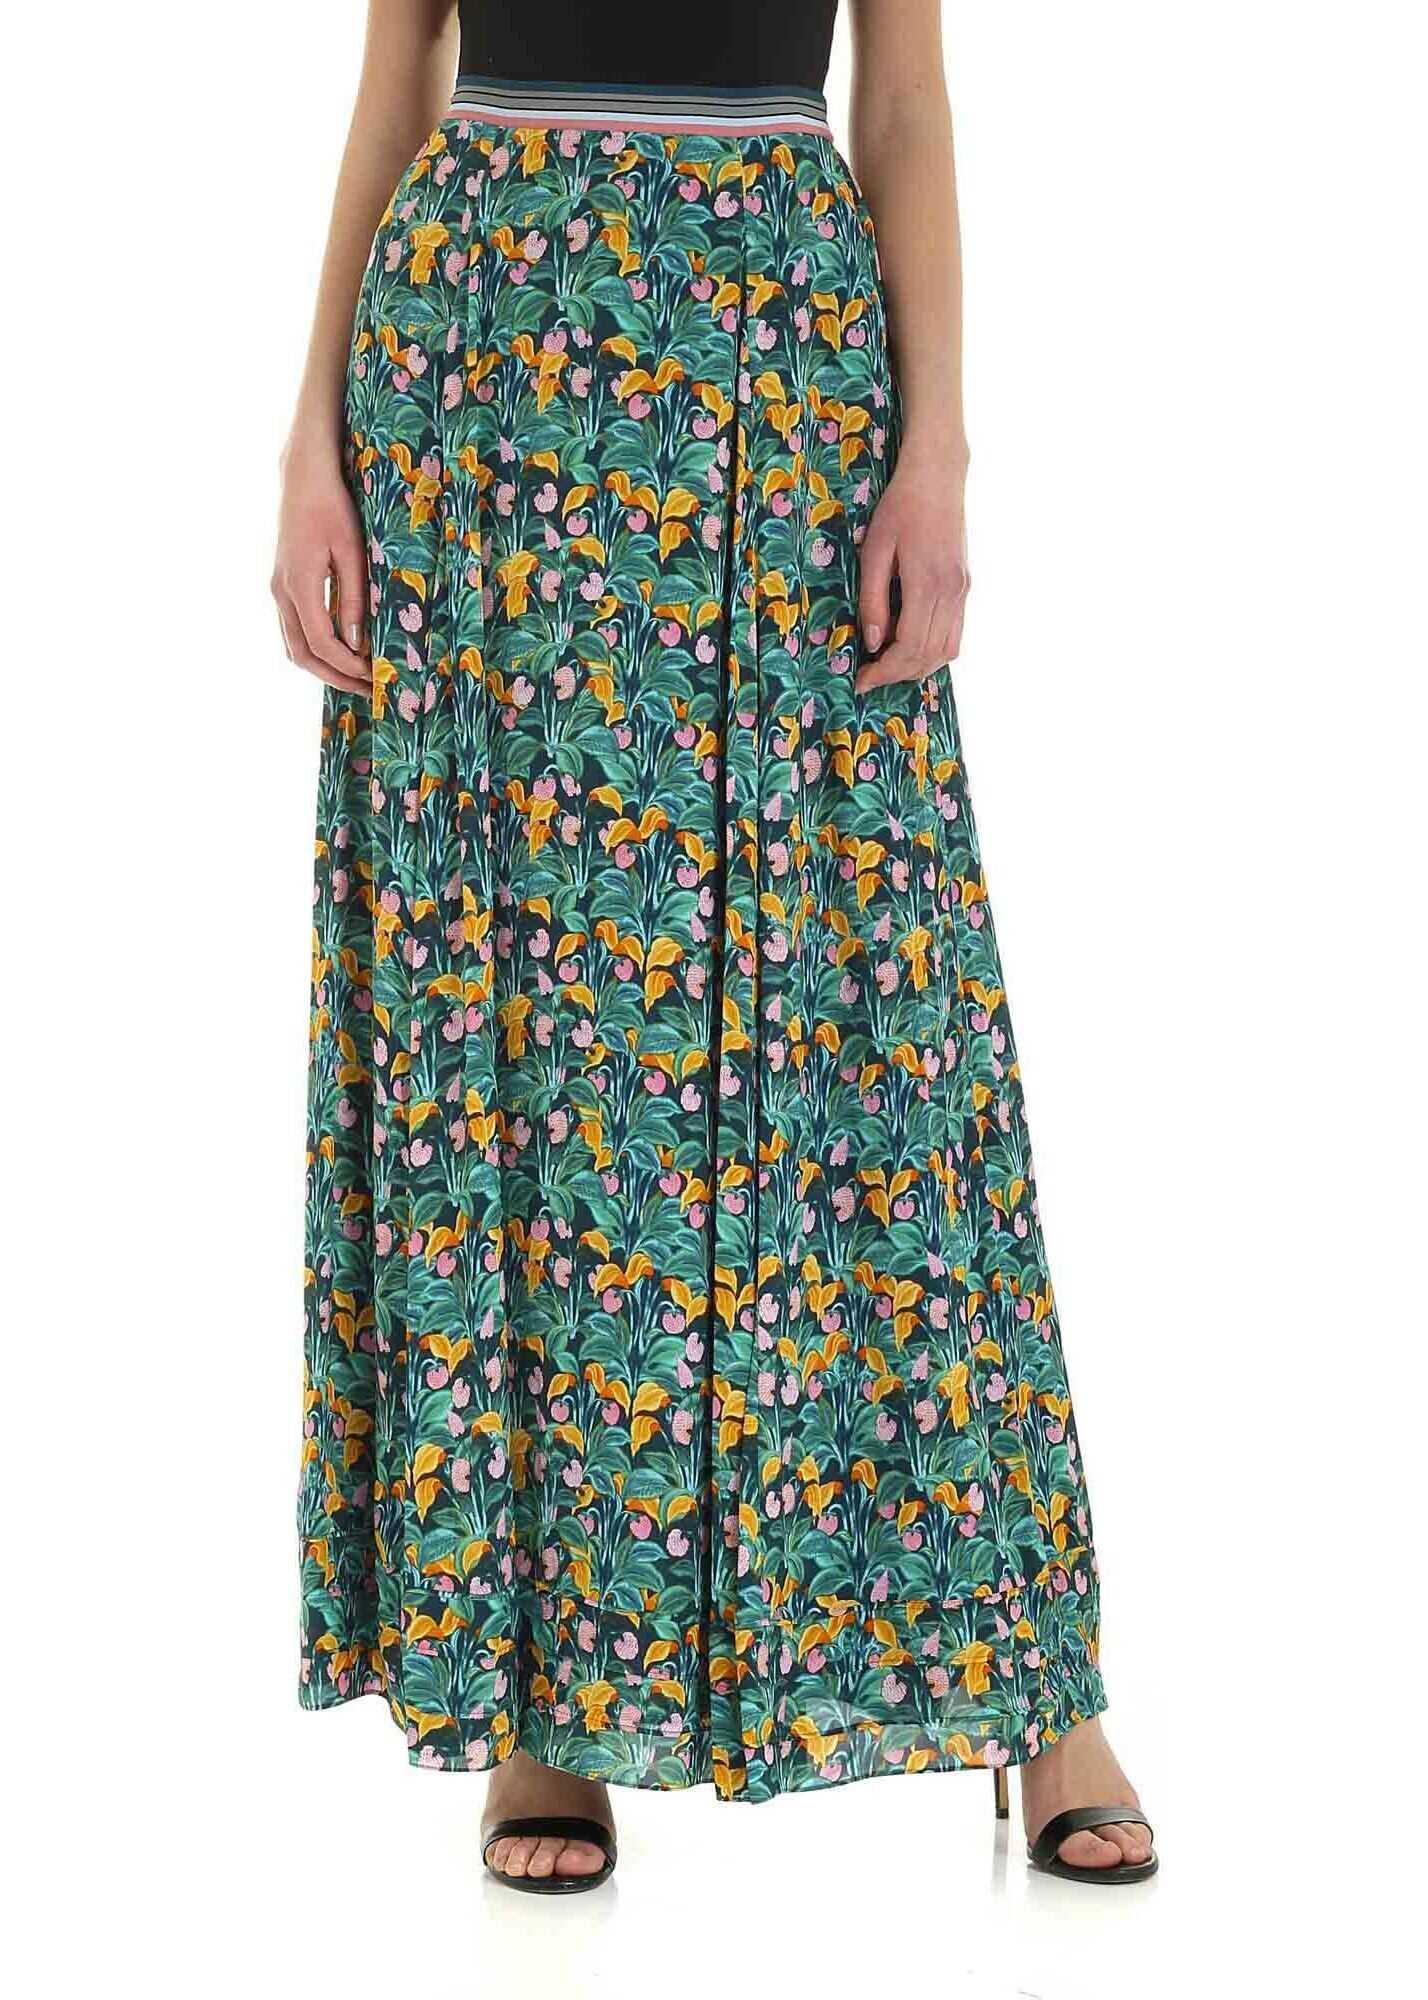 Diane von Furstenberg Heka Multicolor Long Skirt Green